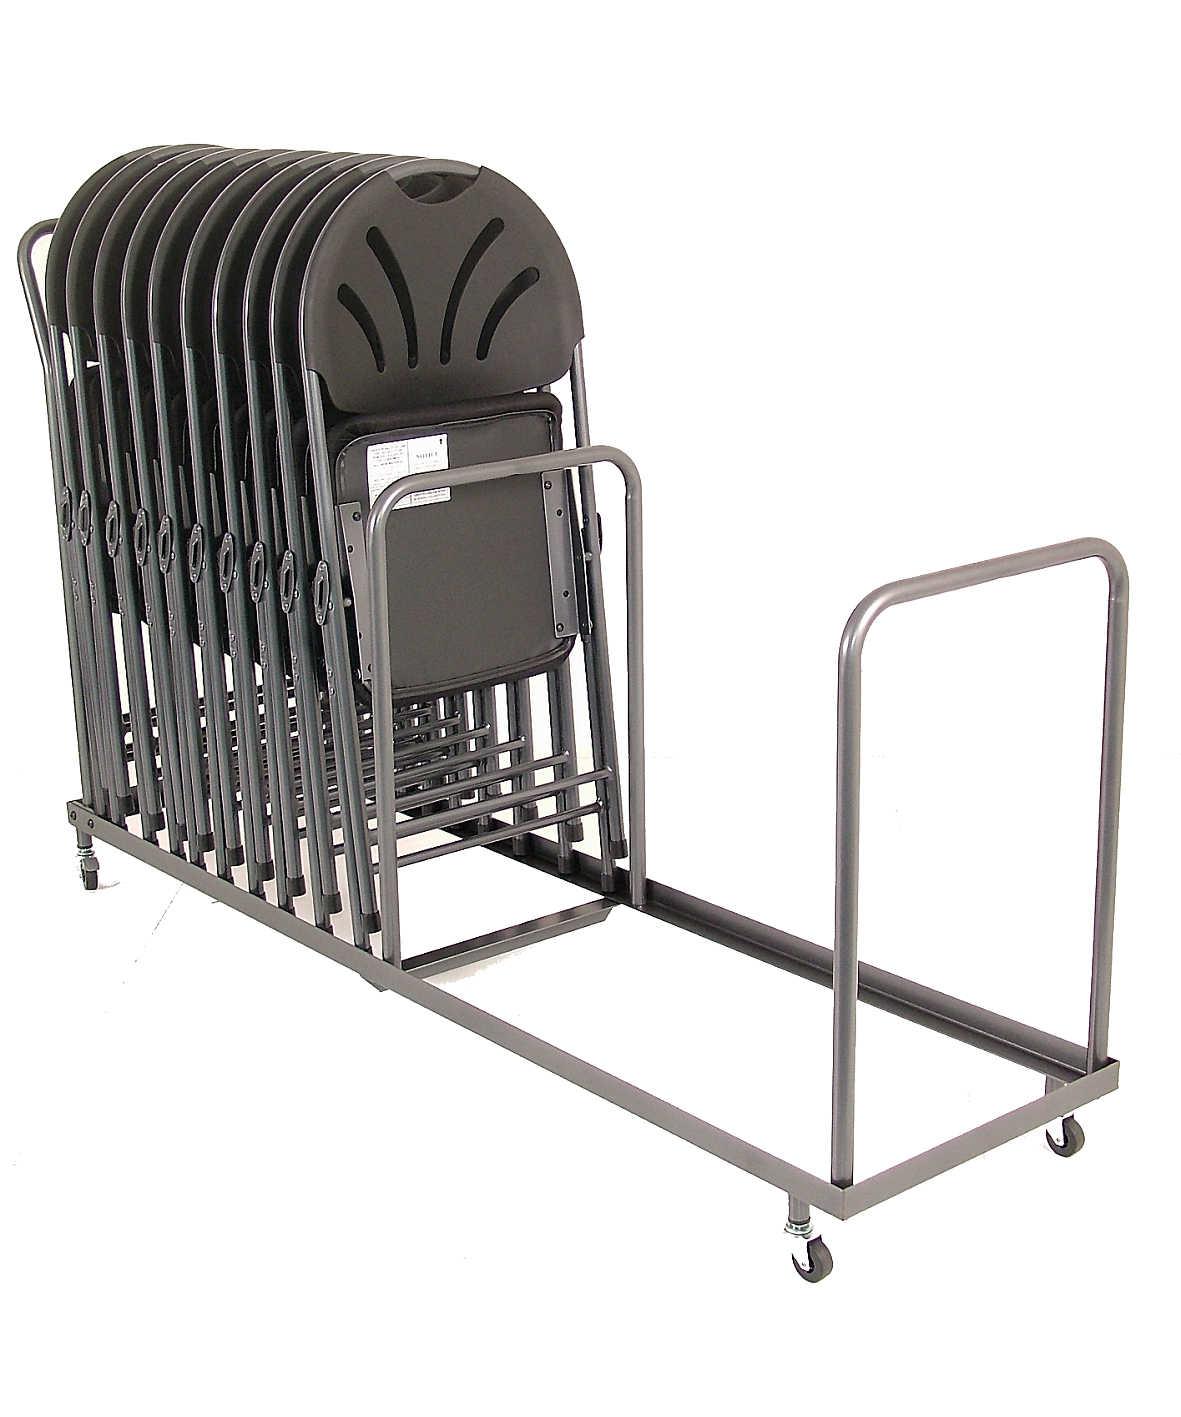 proimages/Product/Chair/Folding_Chair/SHOE_8100.jpg